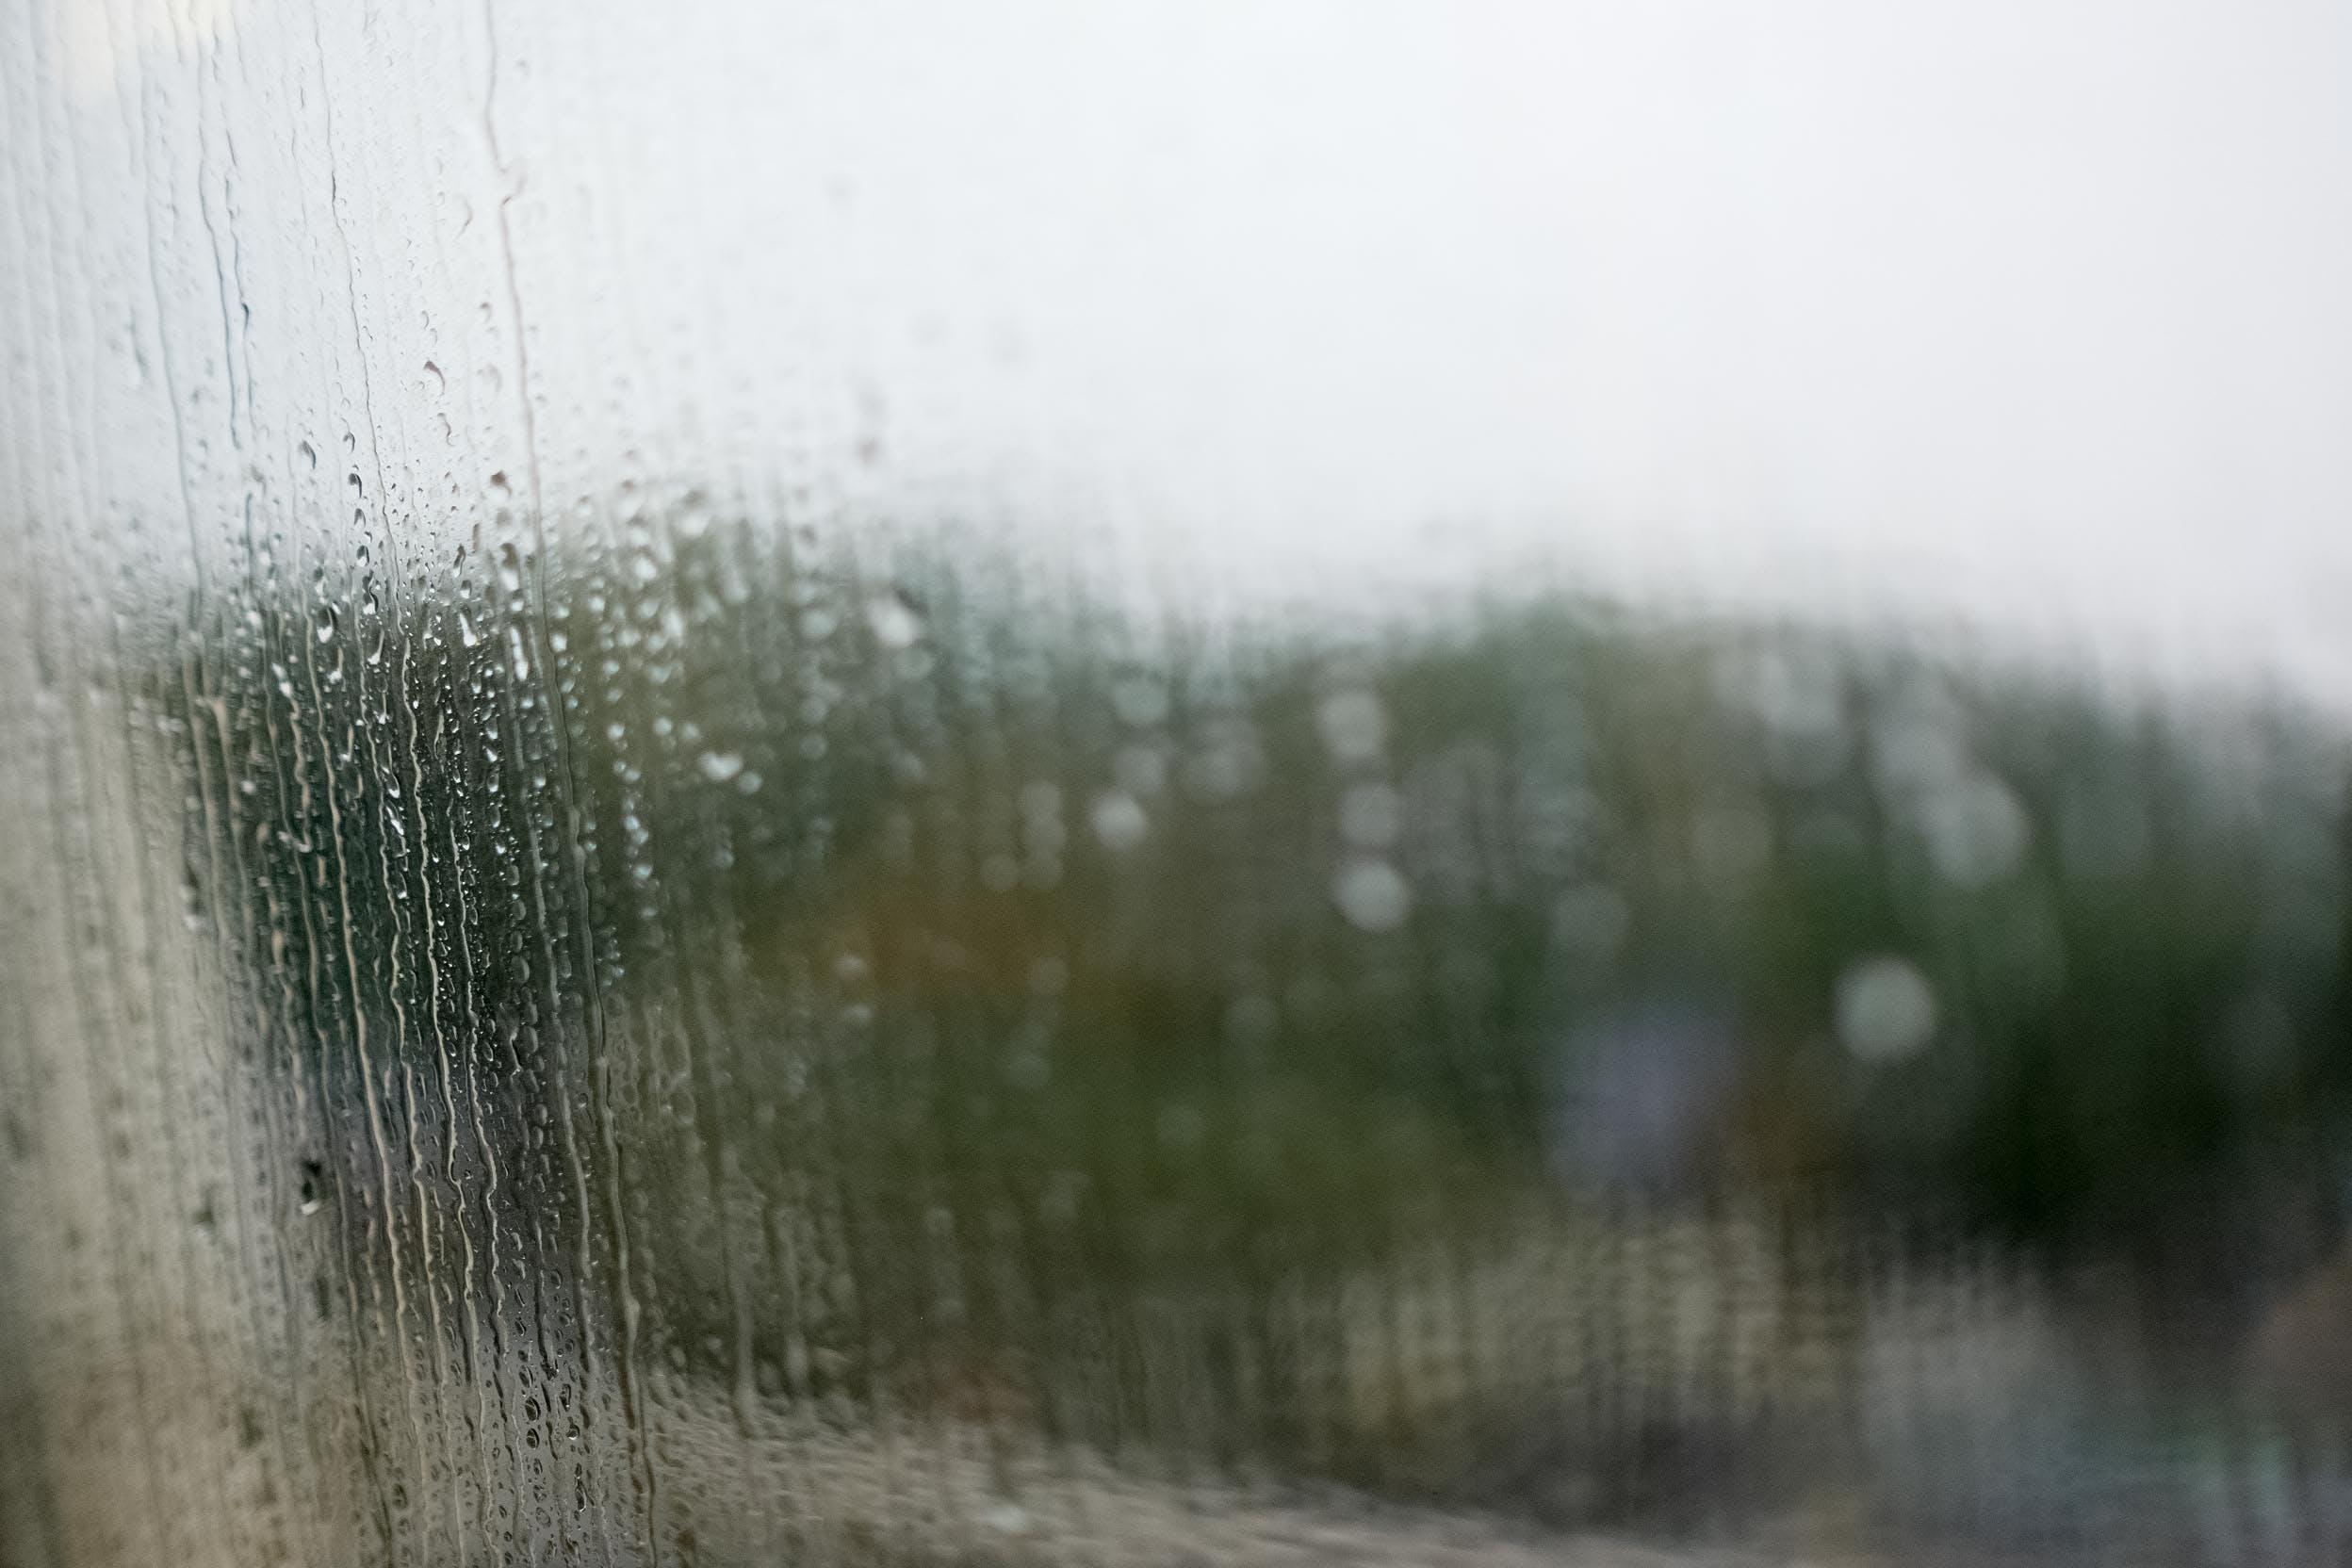 Free stock photo of glass, rain, window, drop